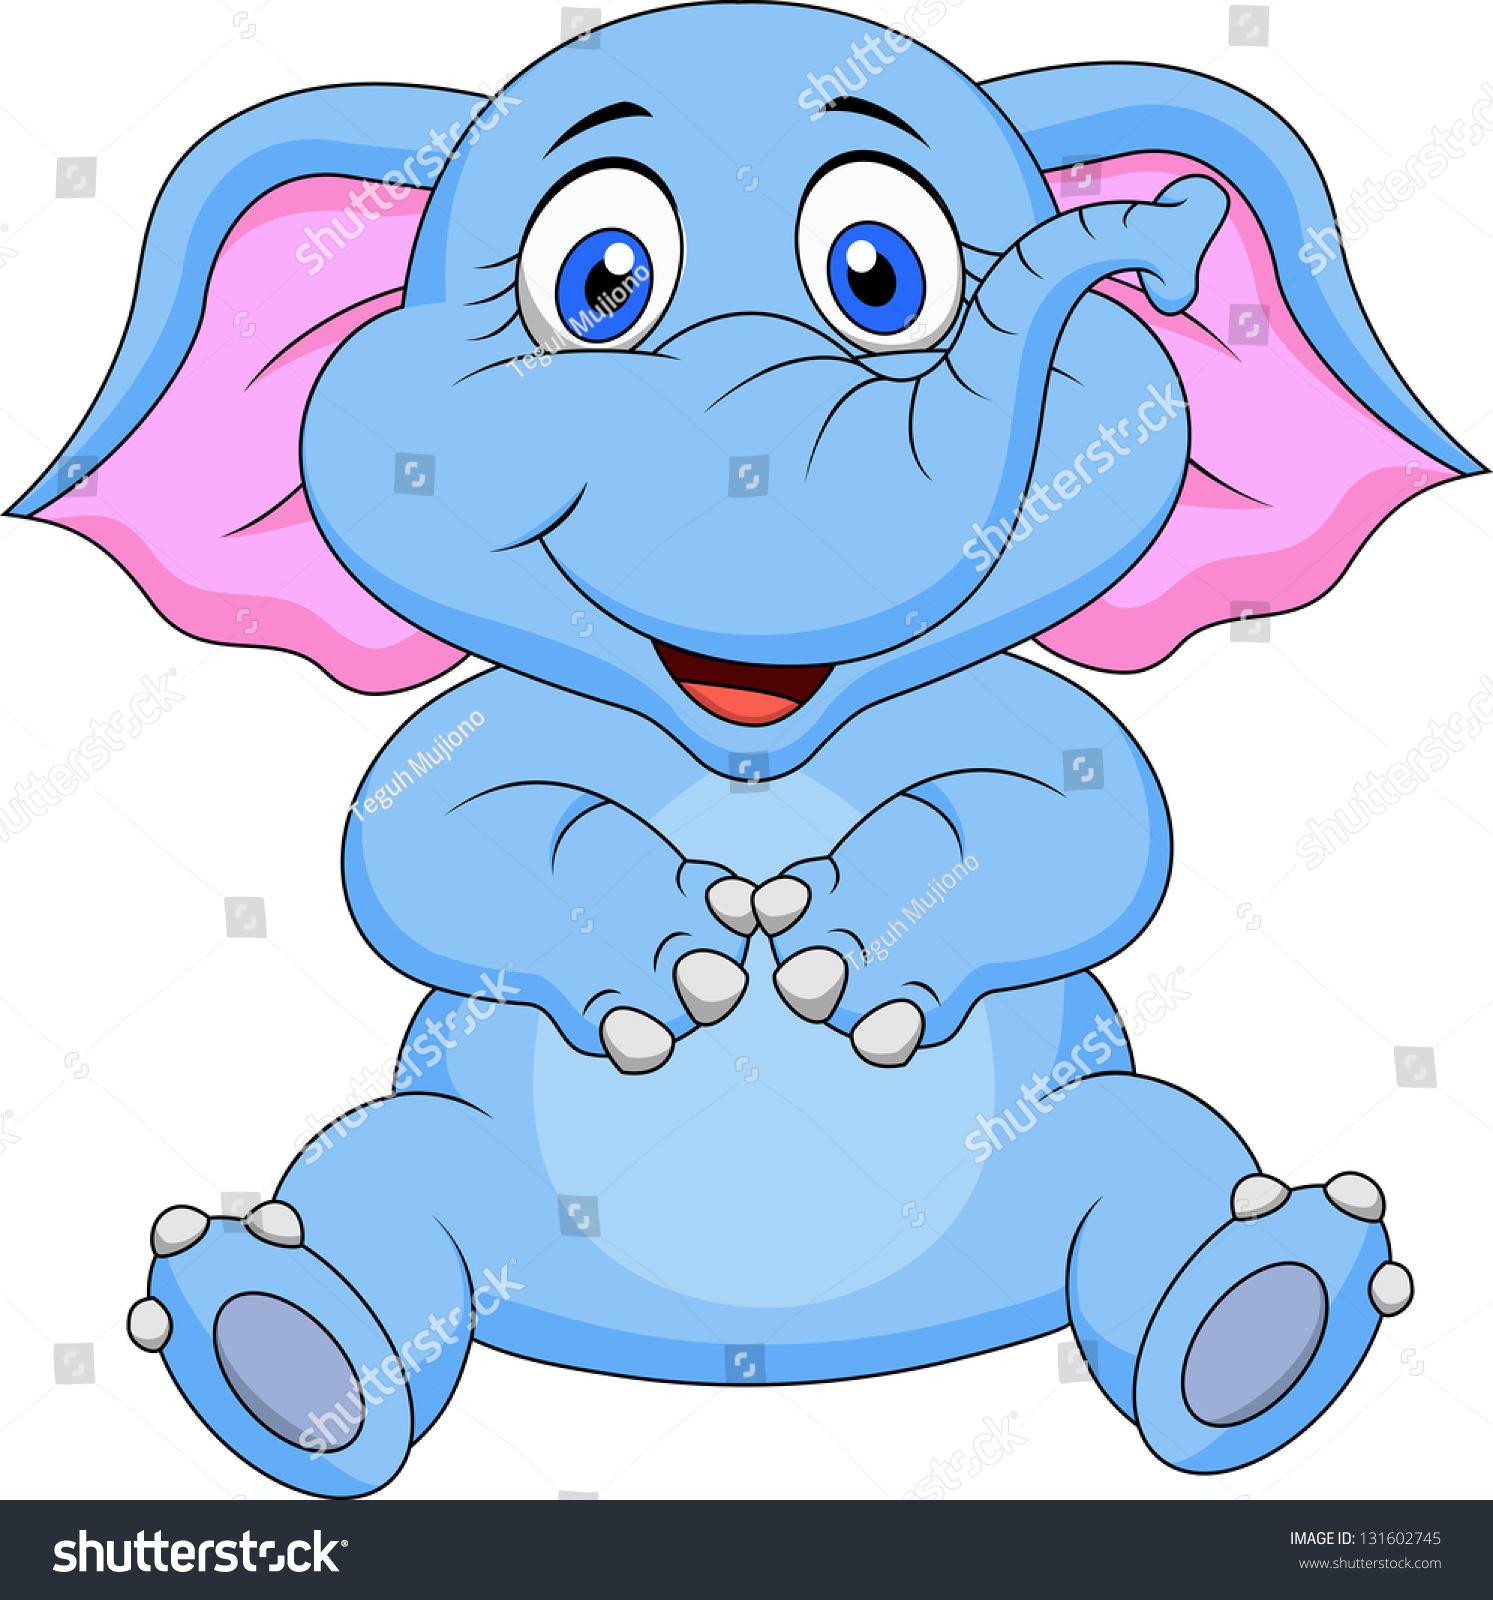 Cute Animated Baby Cartoon Elephant Wallpaper Daily Motivational